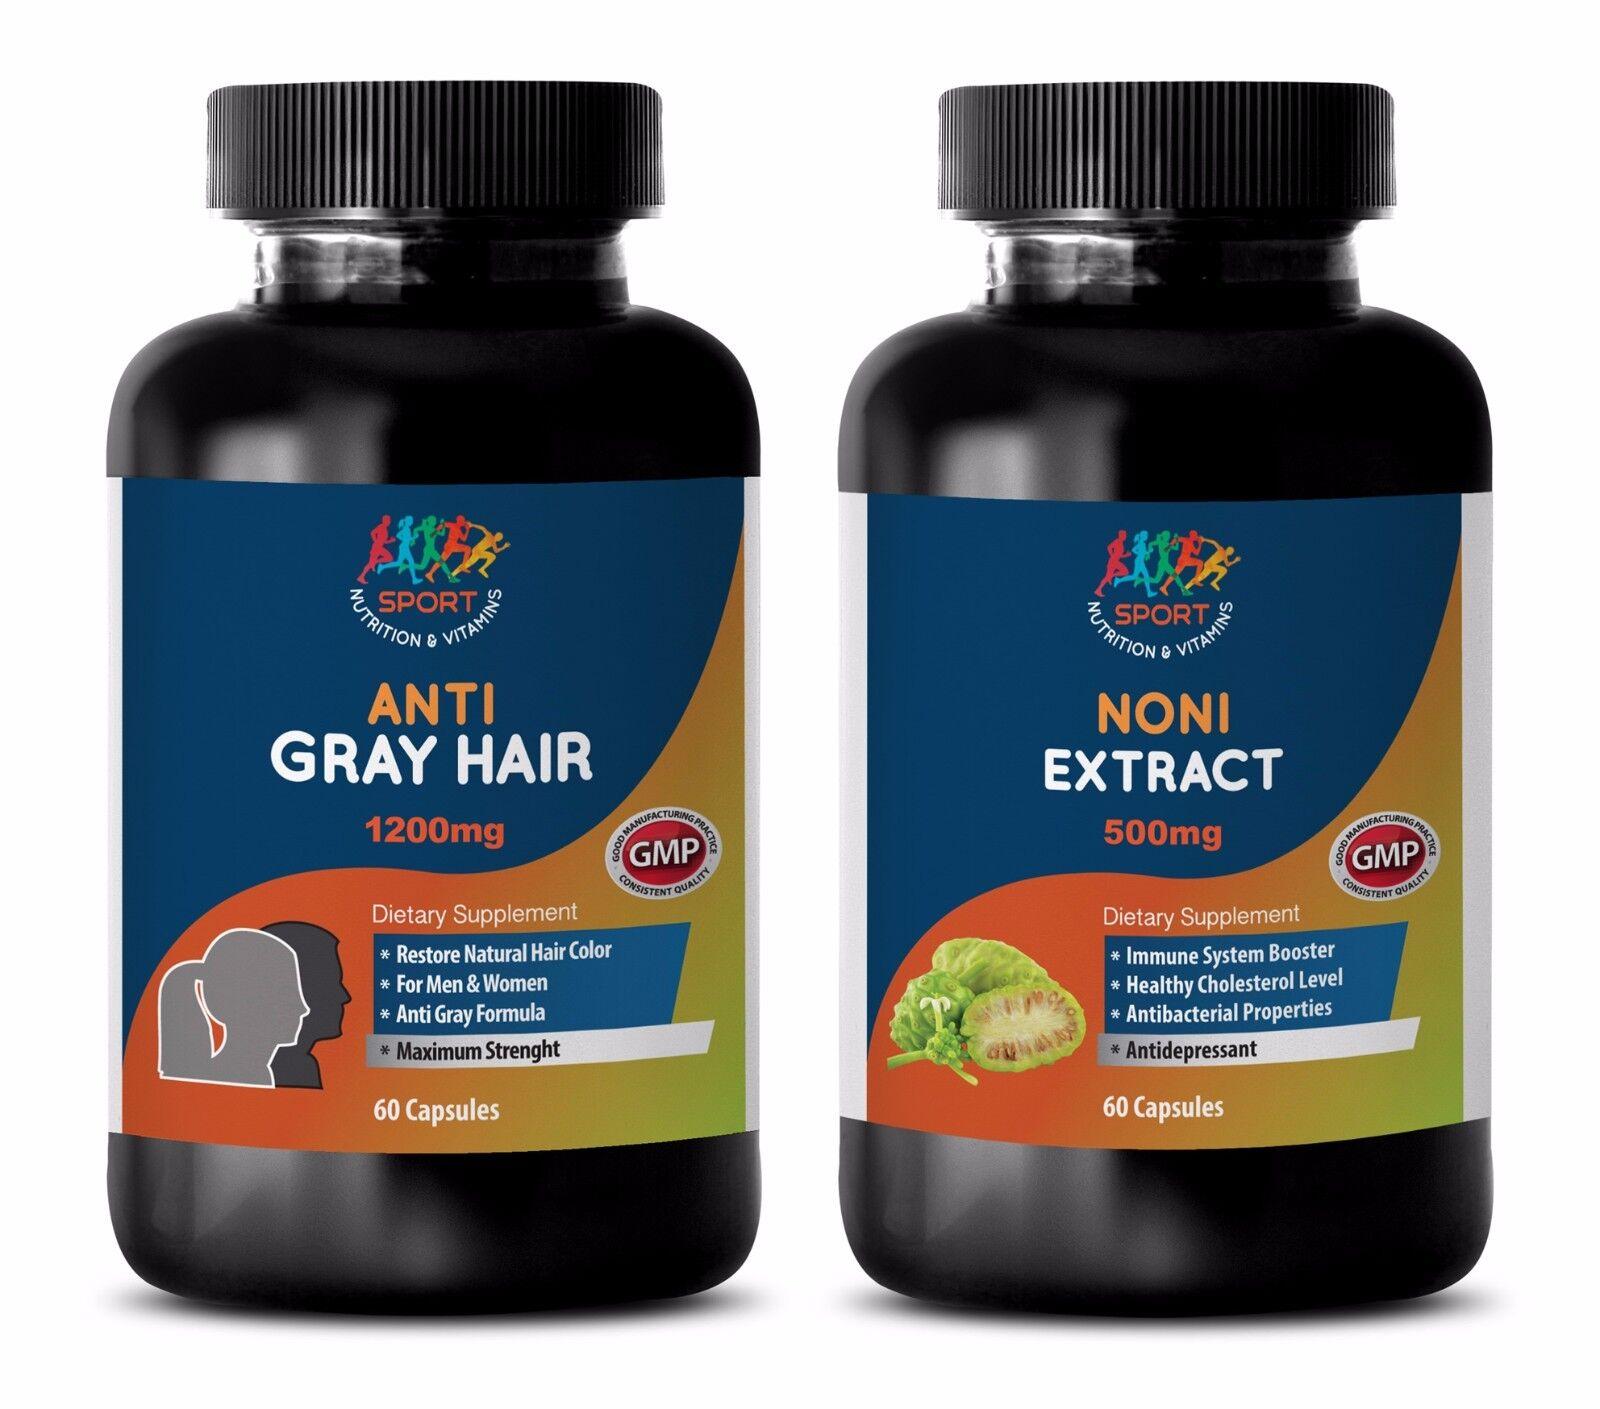 Antioxidant Caps - Gray Hair - Noni Combo 2b - Noni Extract Organic